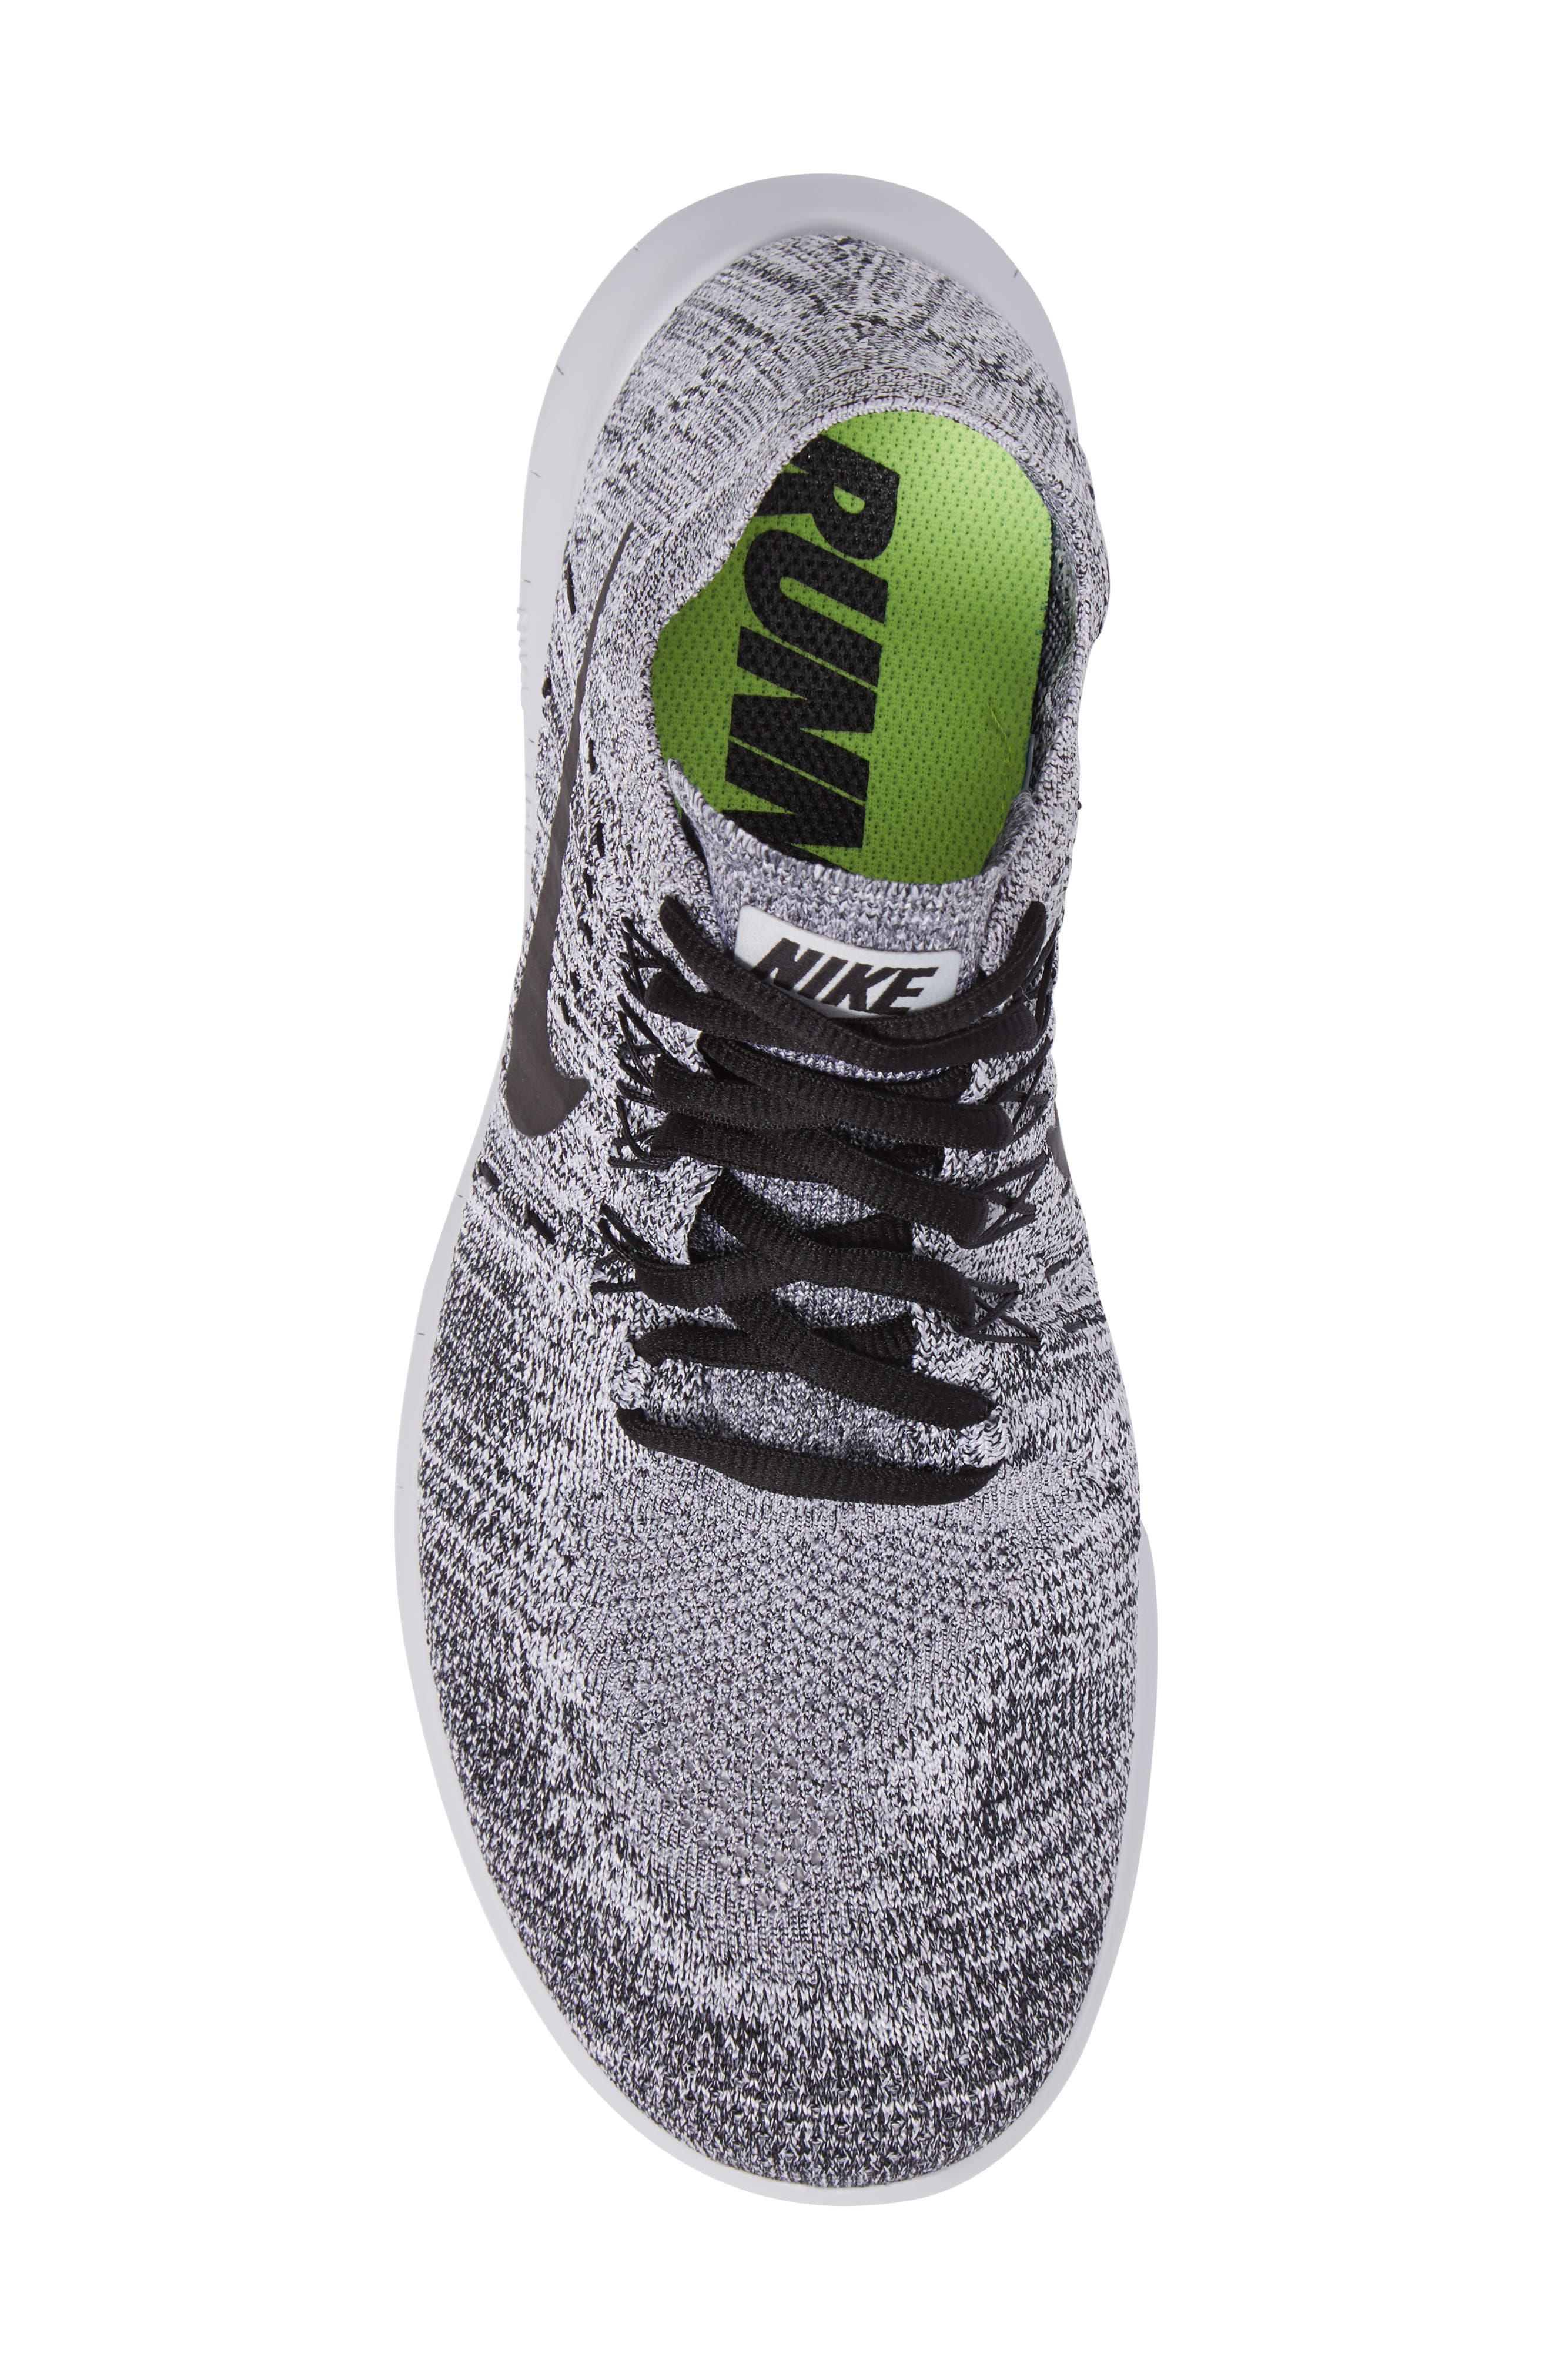 Free Run Flyknit 2017 Running Shoe,                             Alternate thumbnail 5, color,                             White/ Black/Stealth/Platinum